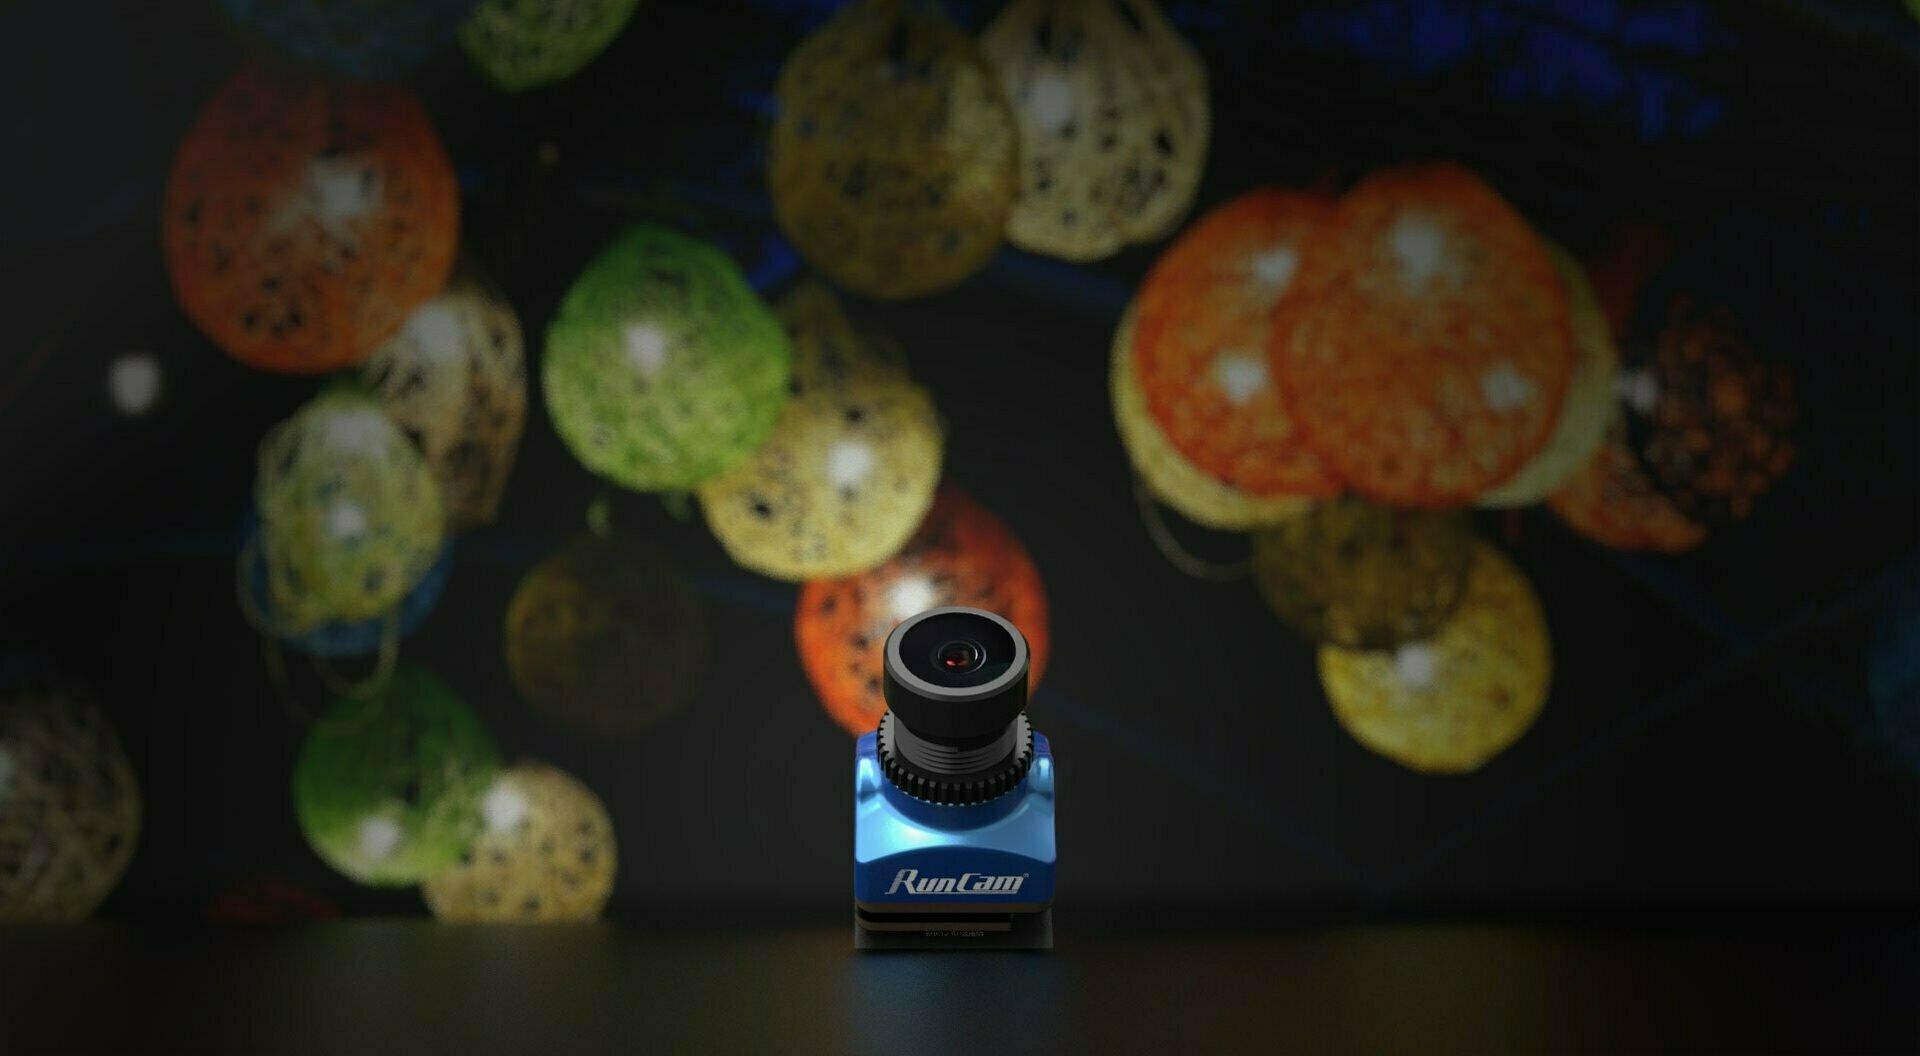 runcam phoenix 2 nano branding product fpv showcase picture mantisfpv e1590483648858